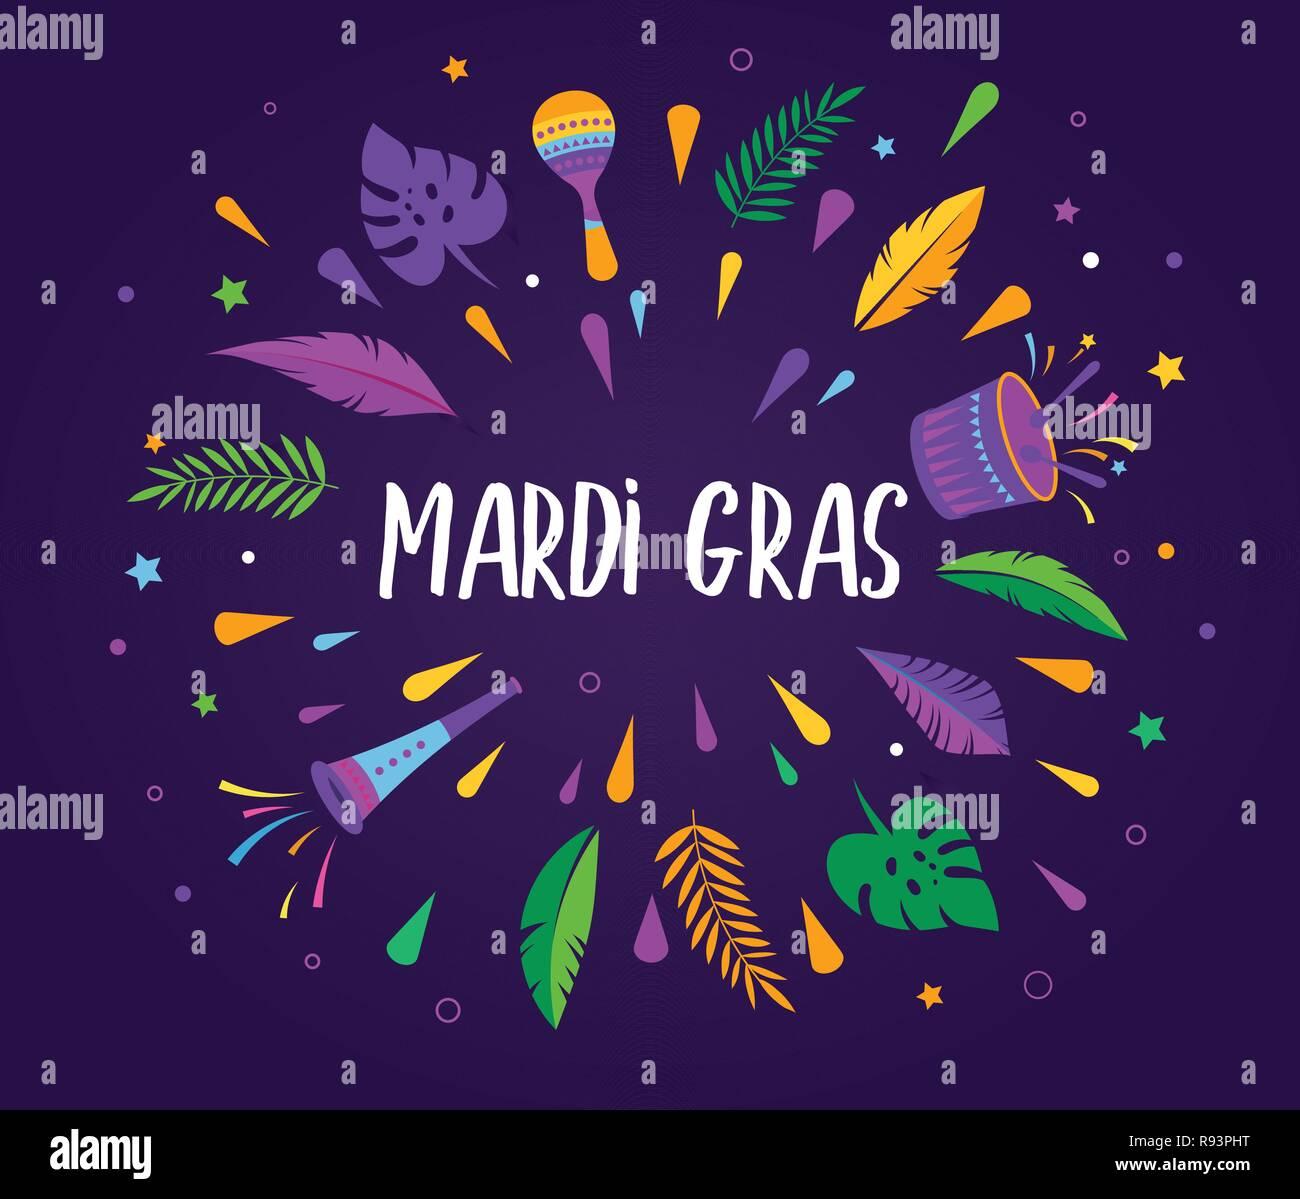 Mardi Gras Template from c8.alamy.com